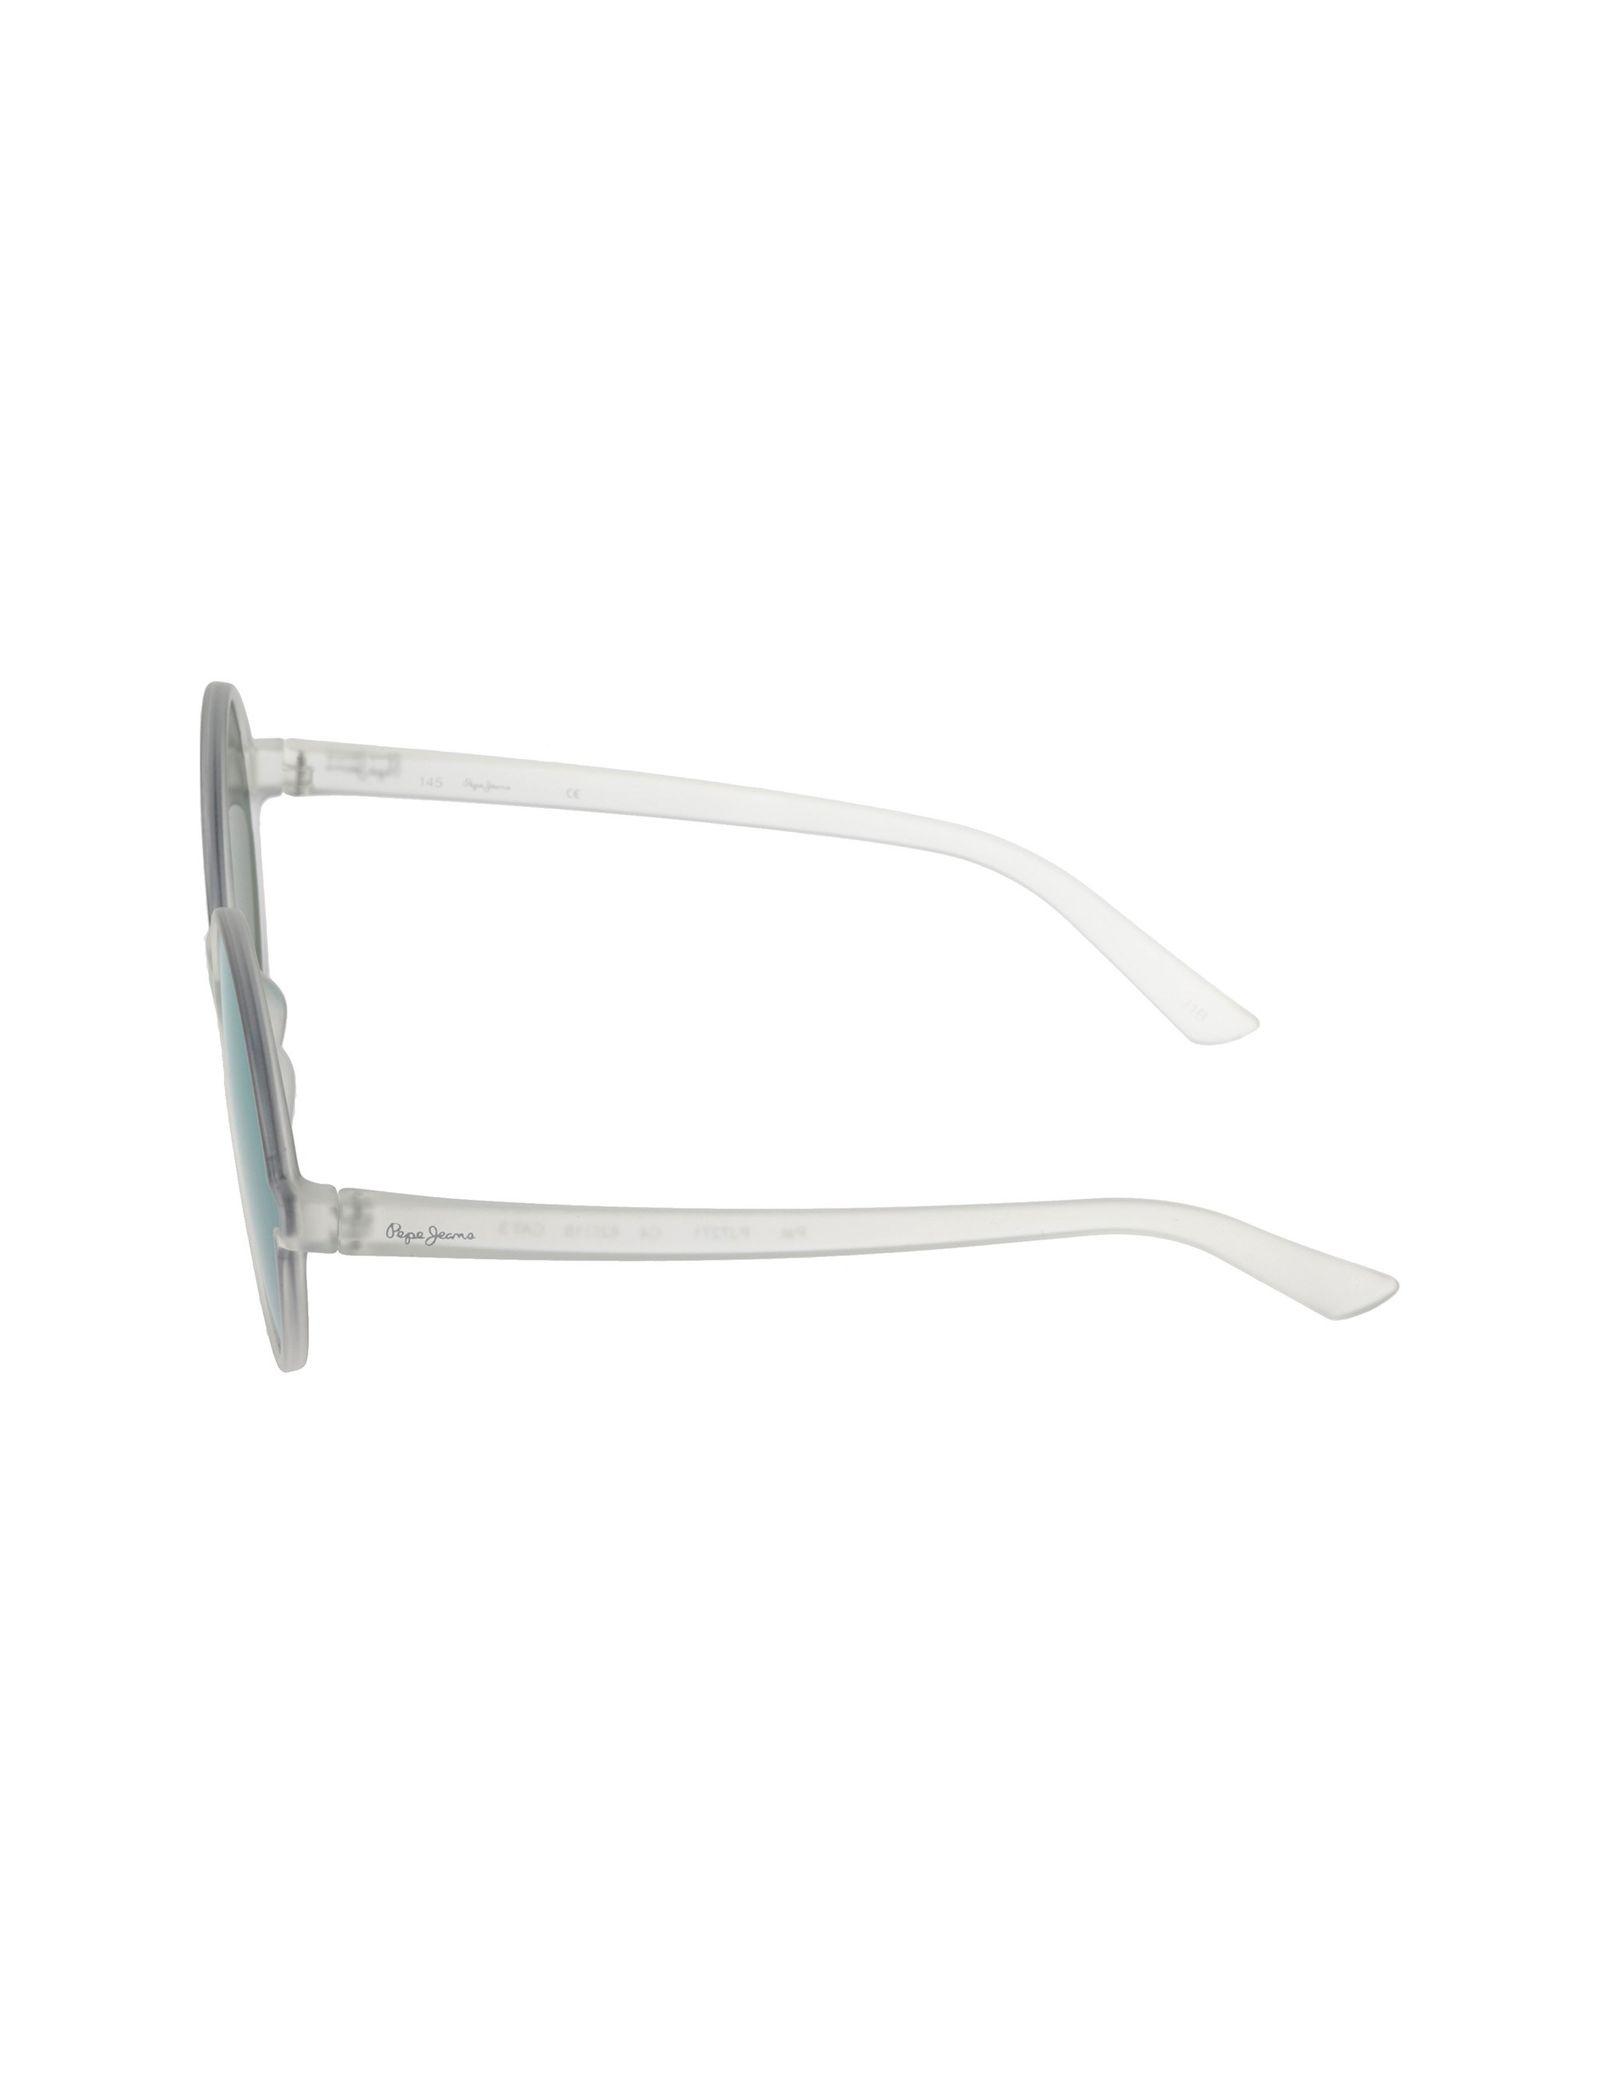 عینک آفتابی گرد زنانه - پپه جینز - شفاف - 3